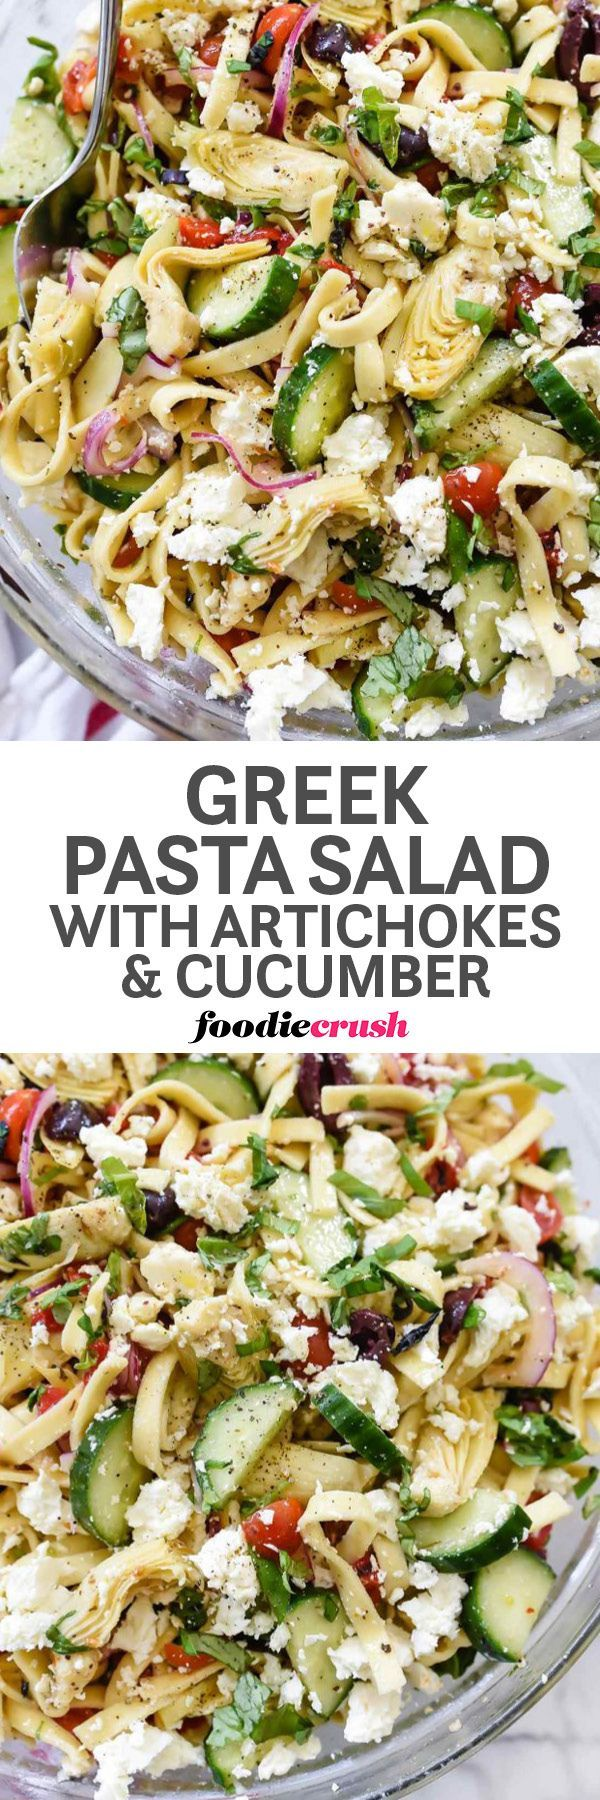 Healthy Easy Greek Pasta Salad Recipe with artichokes and cucumber   Potluck Pasta Salad   BBQ Pasta Salad Recipe   Summer foodiecrush.com